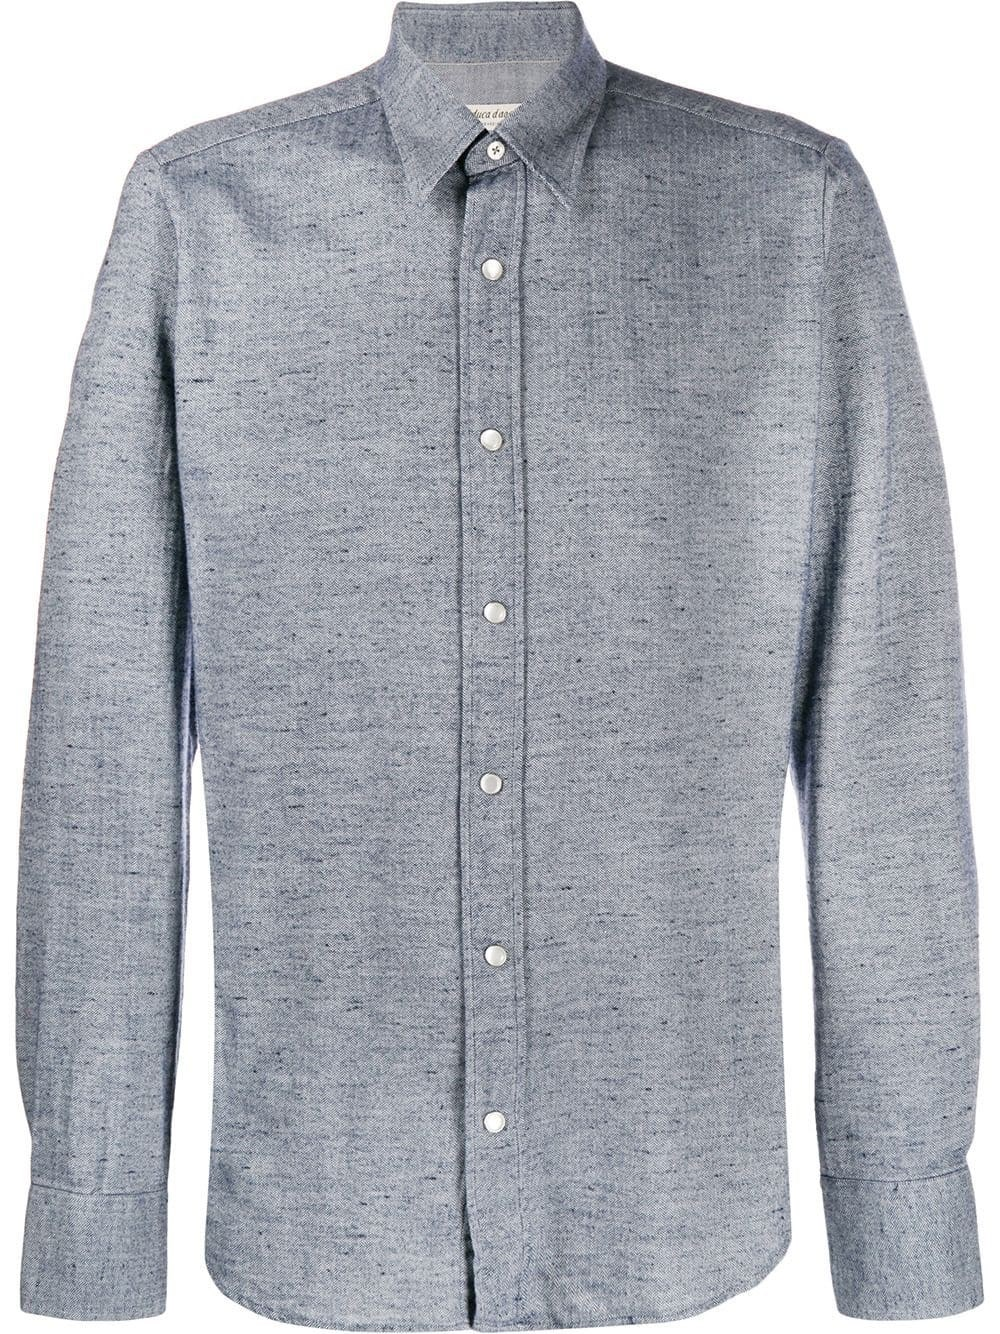 AL DUCA D'AOSTA 1902 Fishbone Pattern Casual Shirt